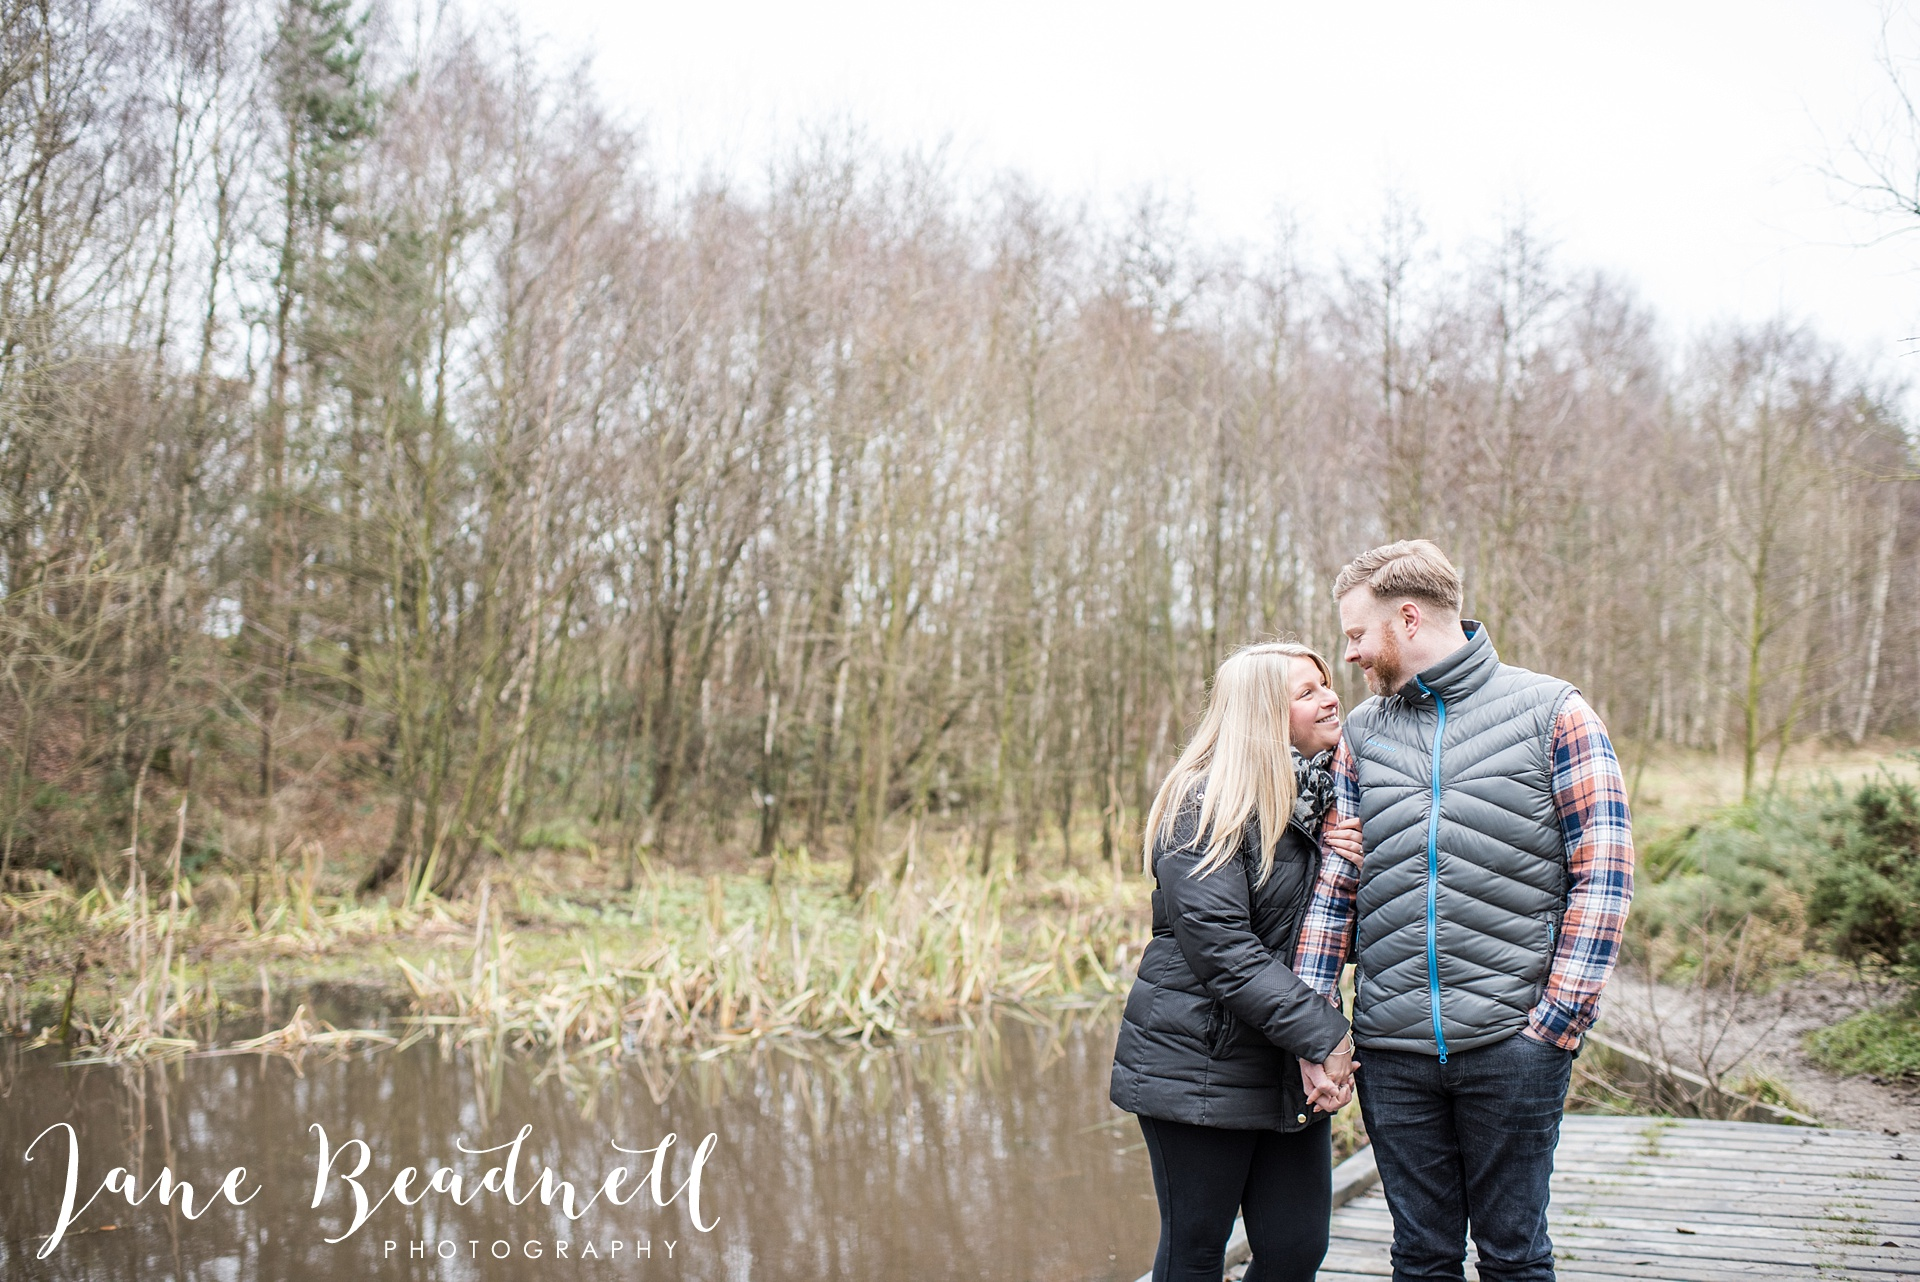 yorkshire-wedding-photographer-jane-beadnell-photography-uk-and-destination-wedding-photographer-engagement-shoot_0022